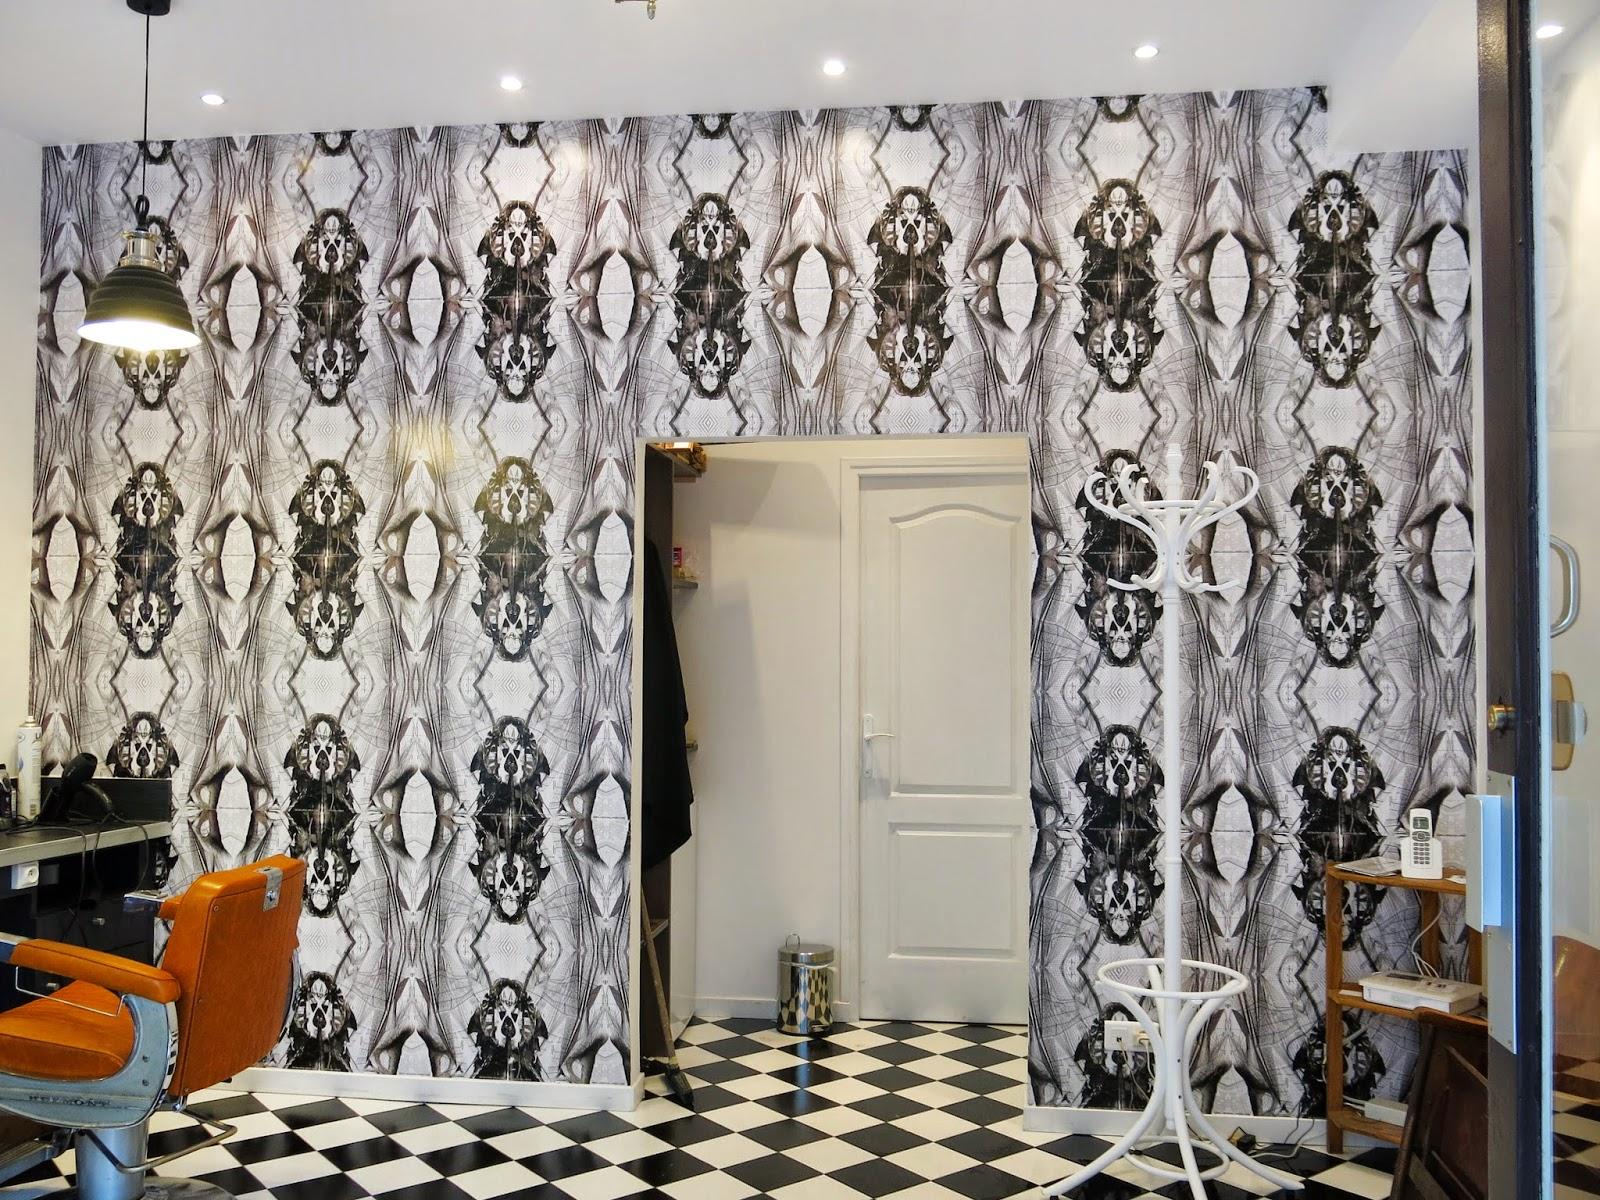 jorge ayala le barbier de monge barber shop in paris jorge ayala paris interiors wallpaper